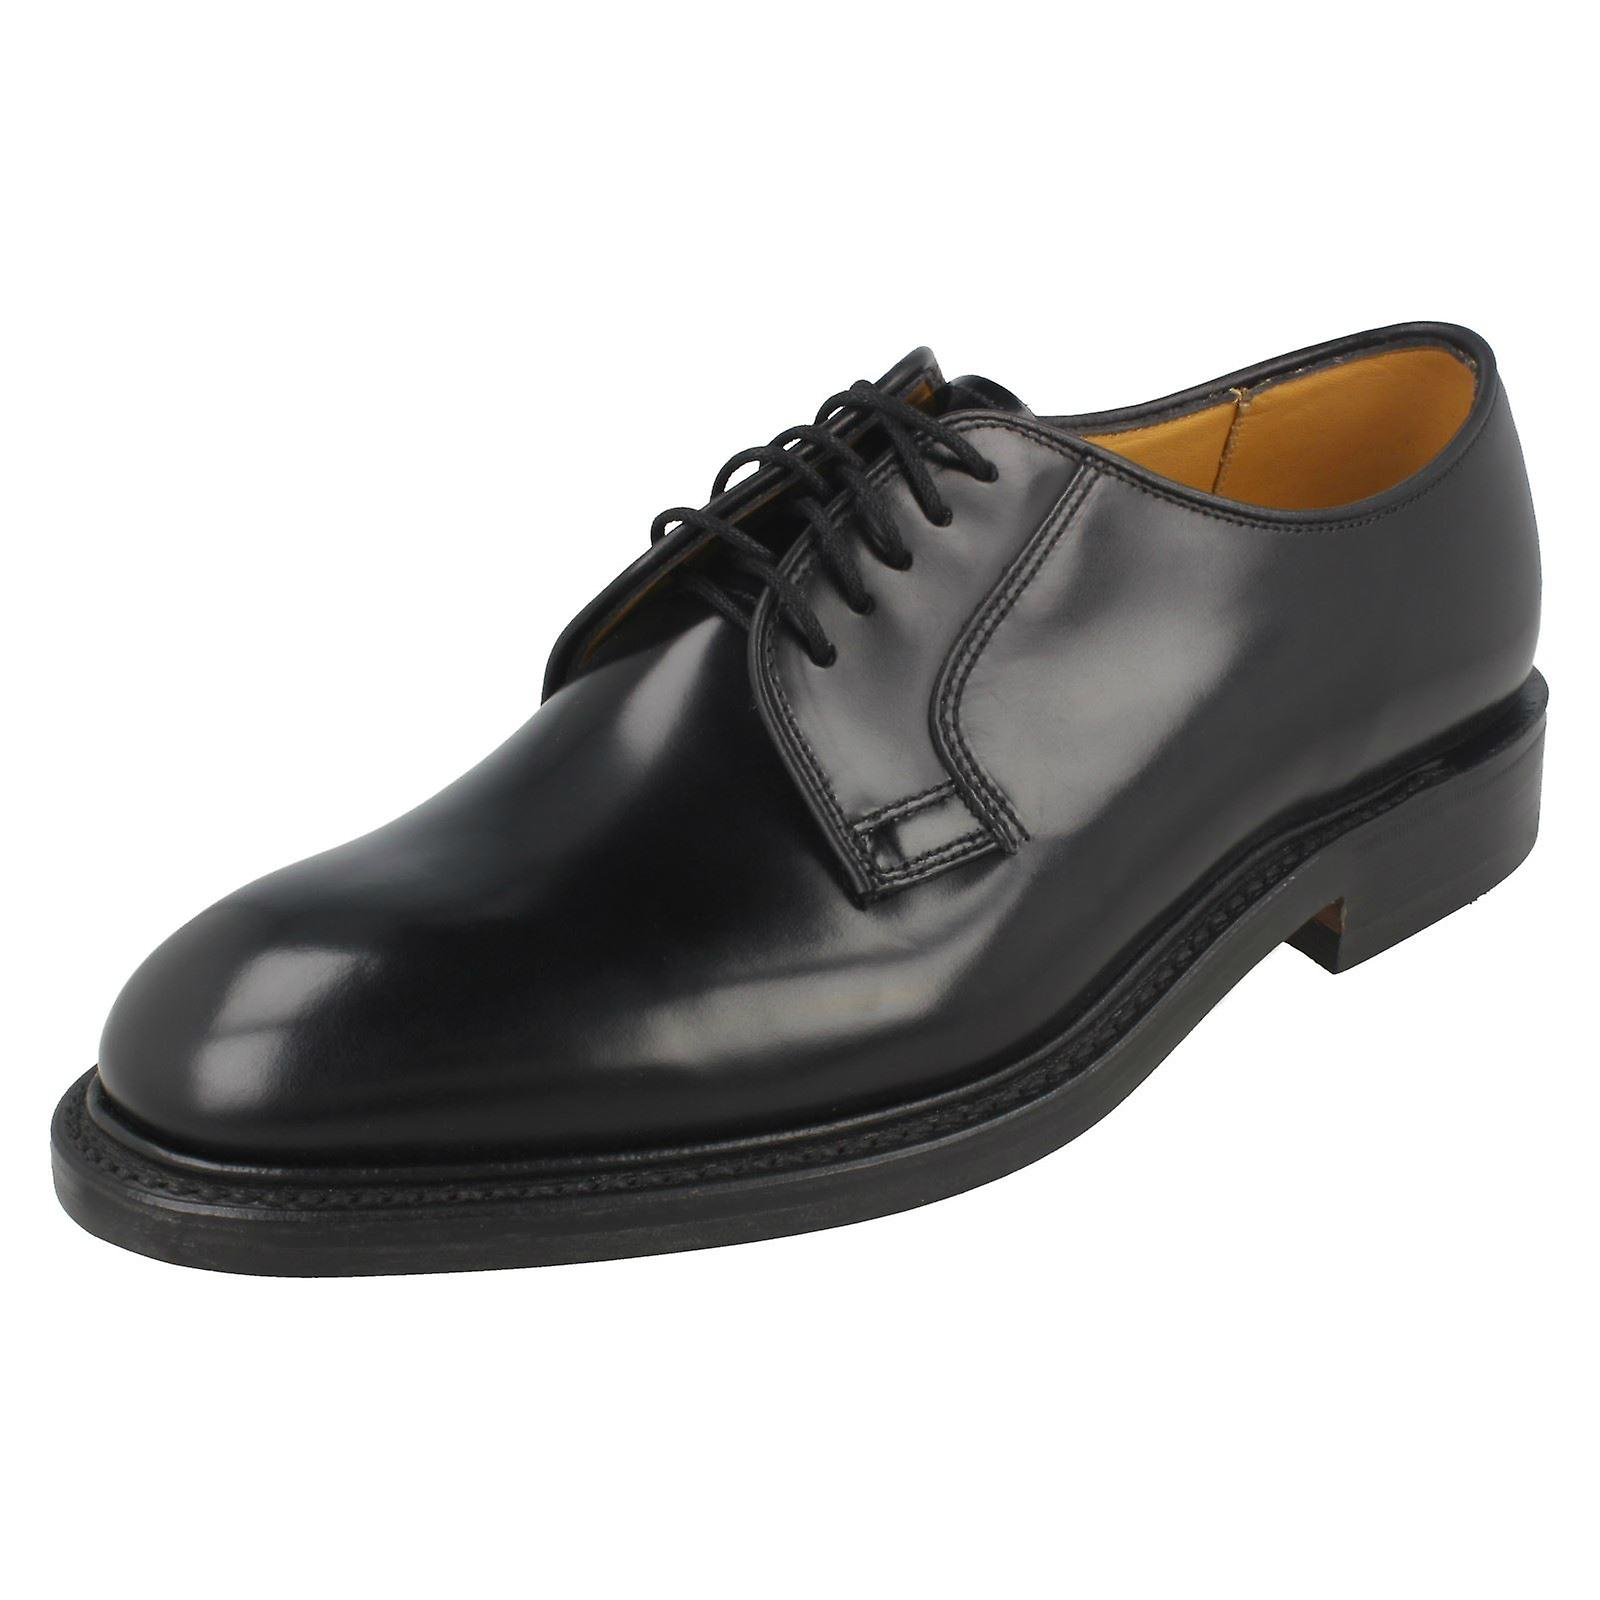 Mens Loake poli cuir chaussures formelle 771B